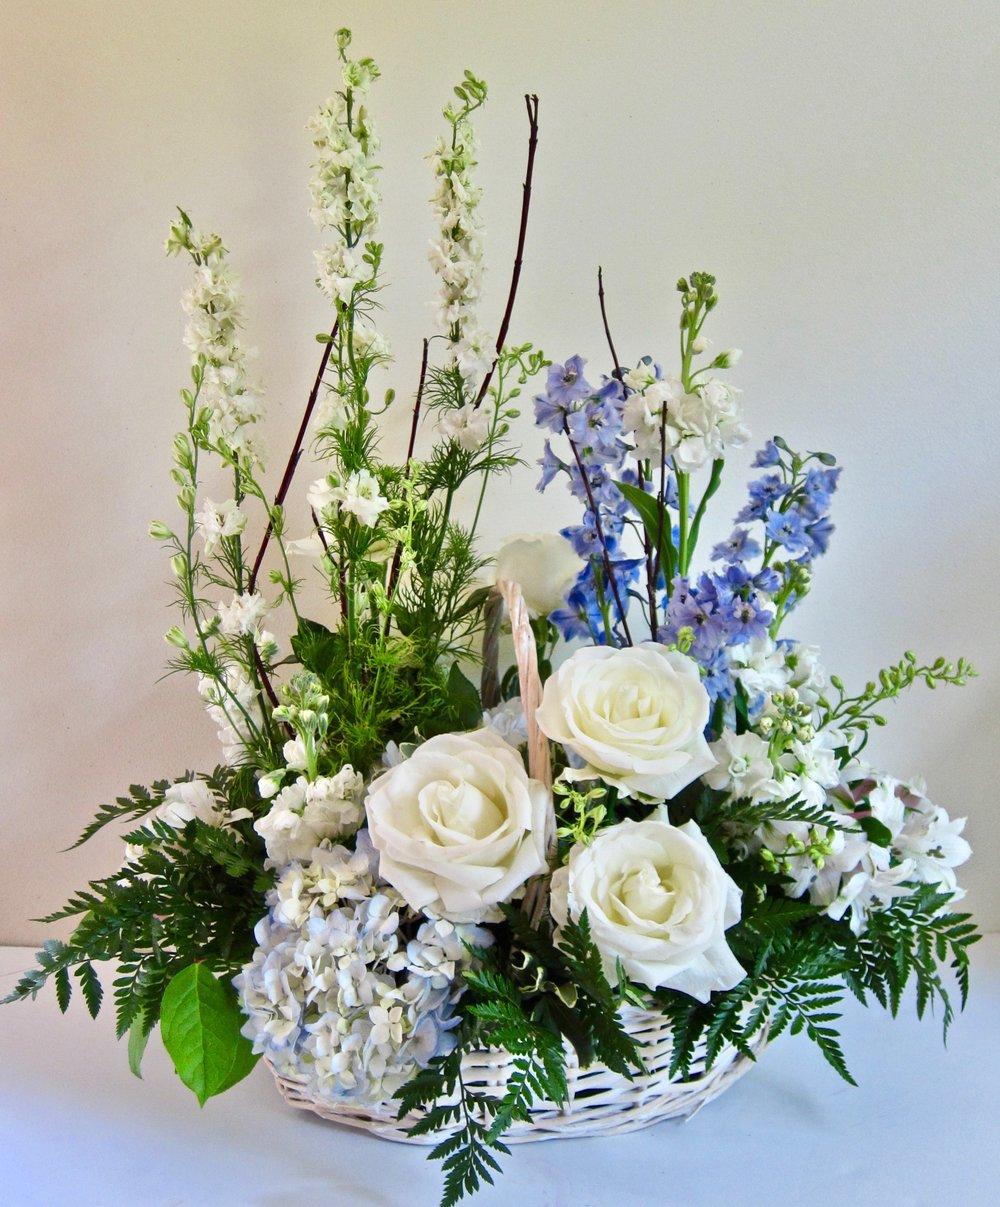 LARGE PREMIUM BASKET    Large basket of premium flowers; lilies or hydrangeas, roses, hydrangeas, snapdragons or larkspur or delphinium, $110, in white or tan basket .